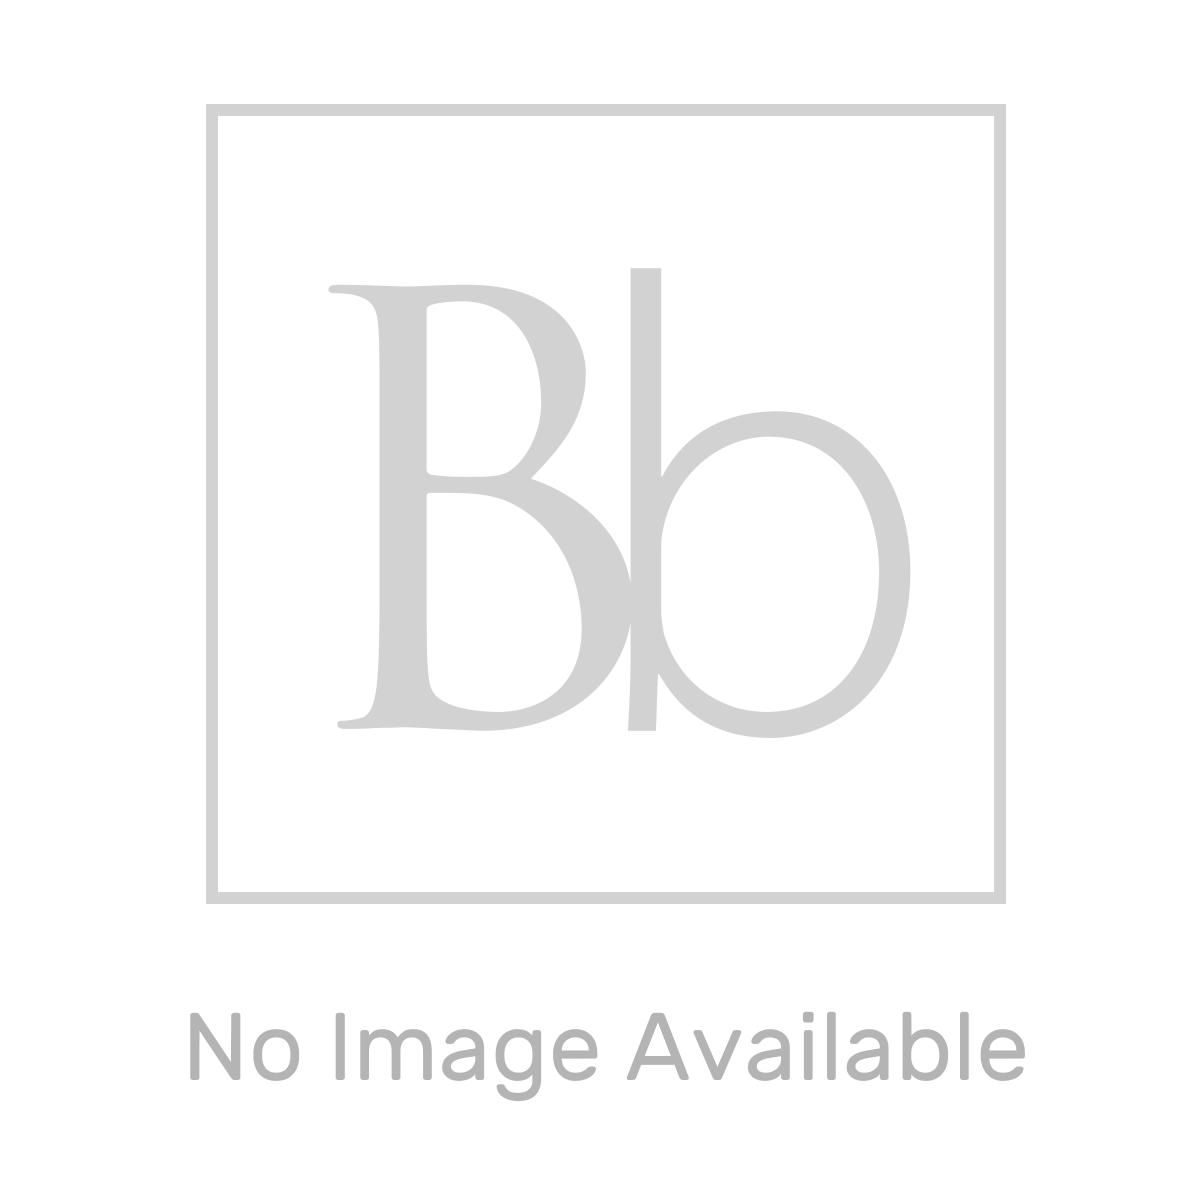 April Prestige2 Frameless Single Door Offset Quadrant Shower Enclosure